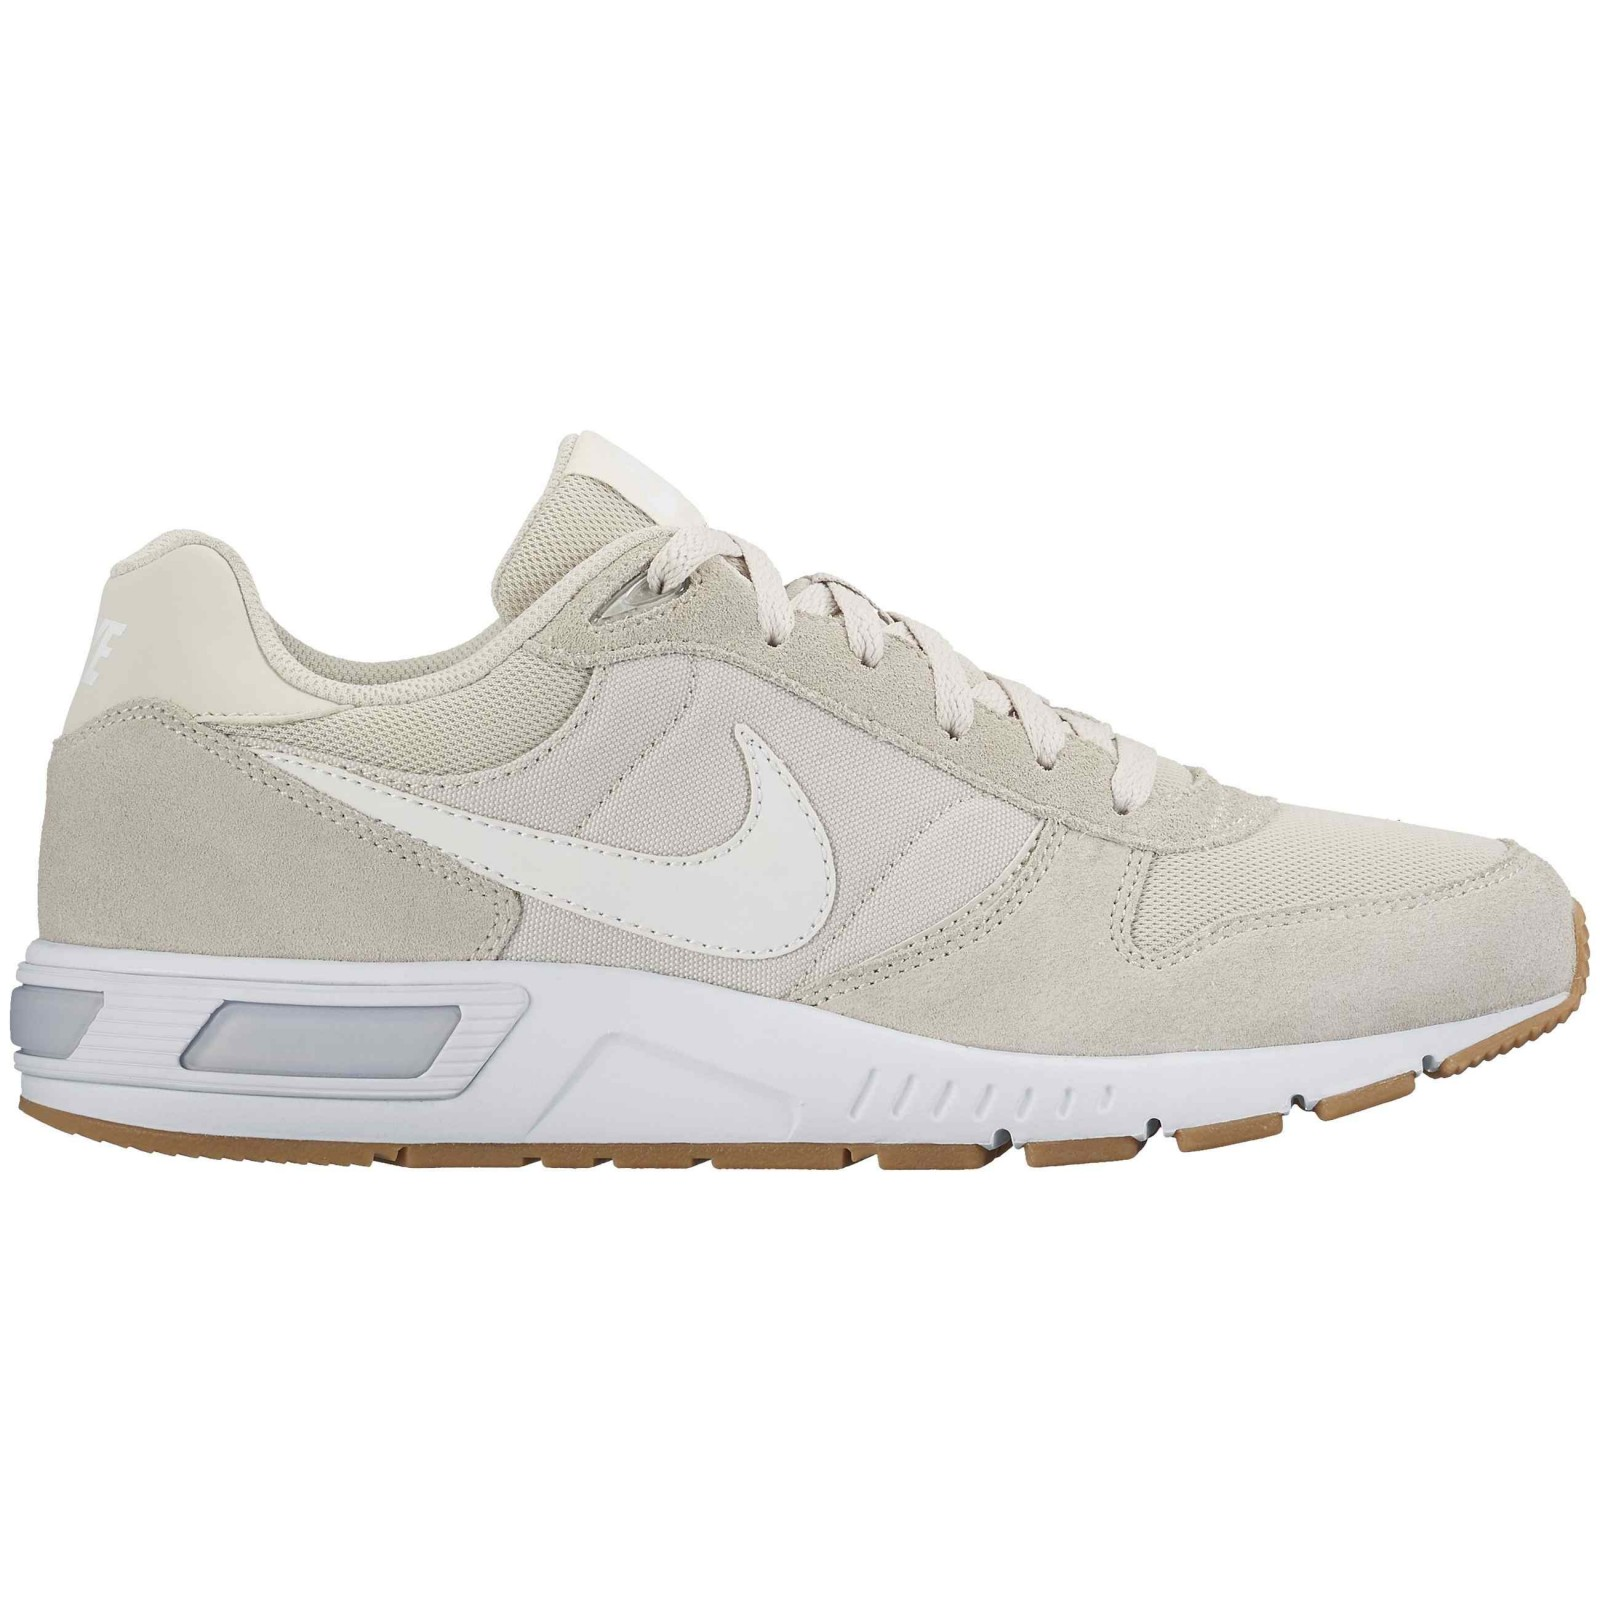 Pánské tenisky Nike NIGHTGAZER  6ce3cdc804b